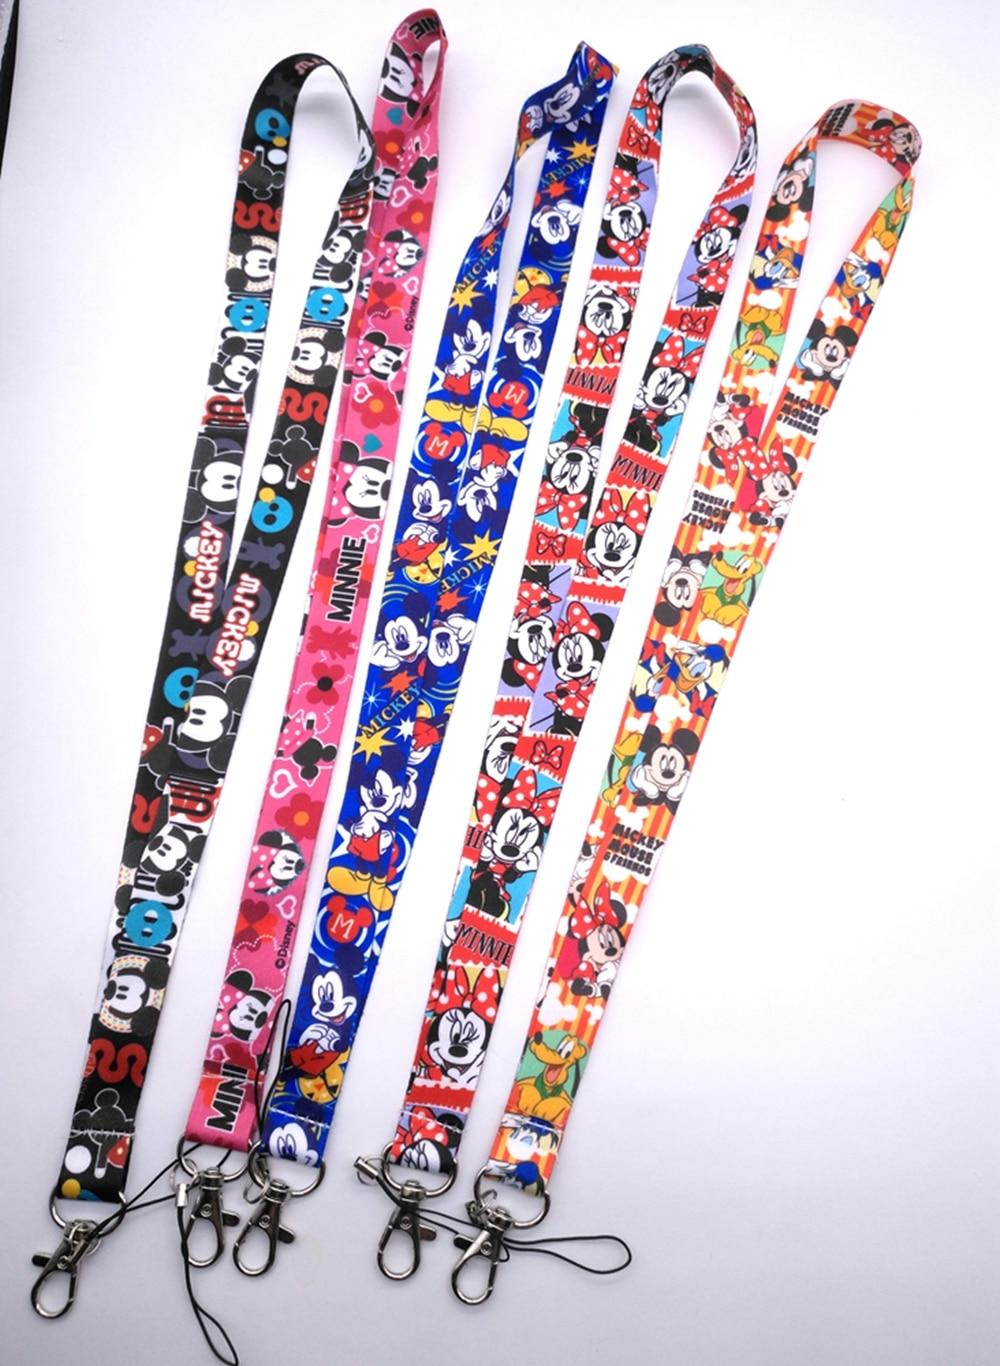 10 pcs/20 pcs/50 pcs cartoon miceky minnie   Lanyard Key Lanyard Cosplay Badge ID Cards Holders Neck